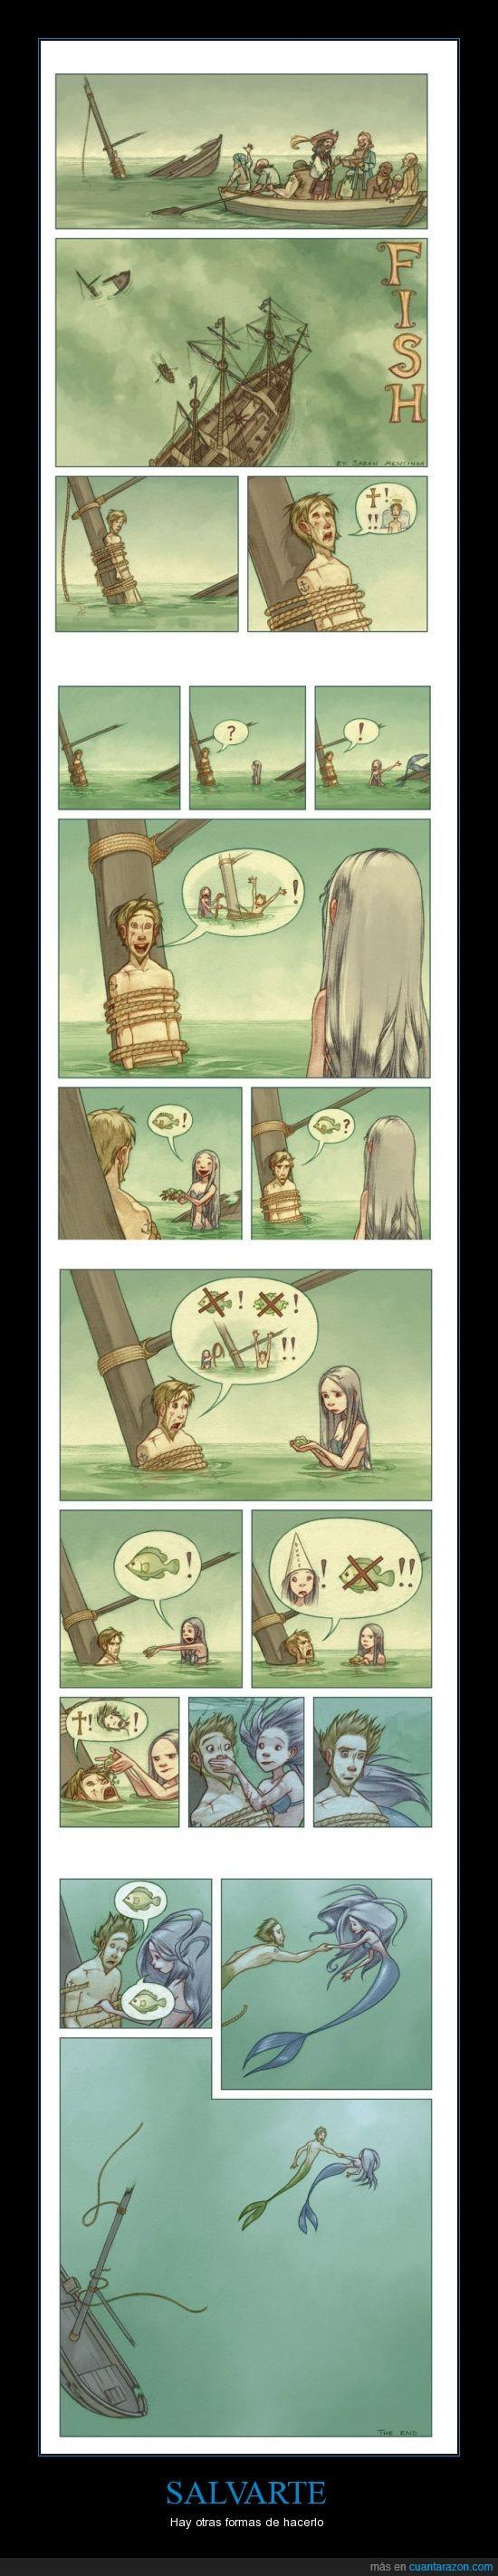 ayudar,pescado,pirata,salvar,sirena,vida